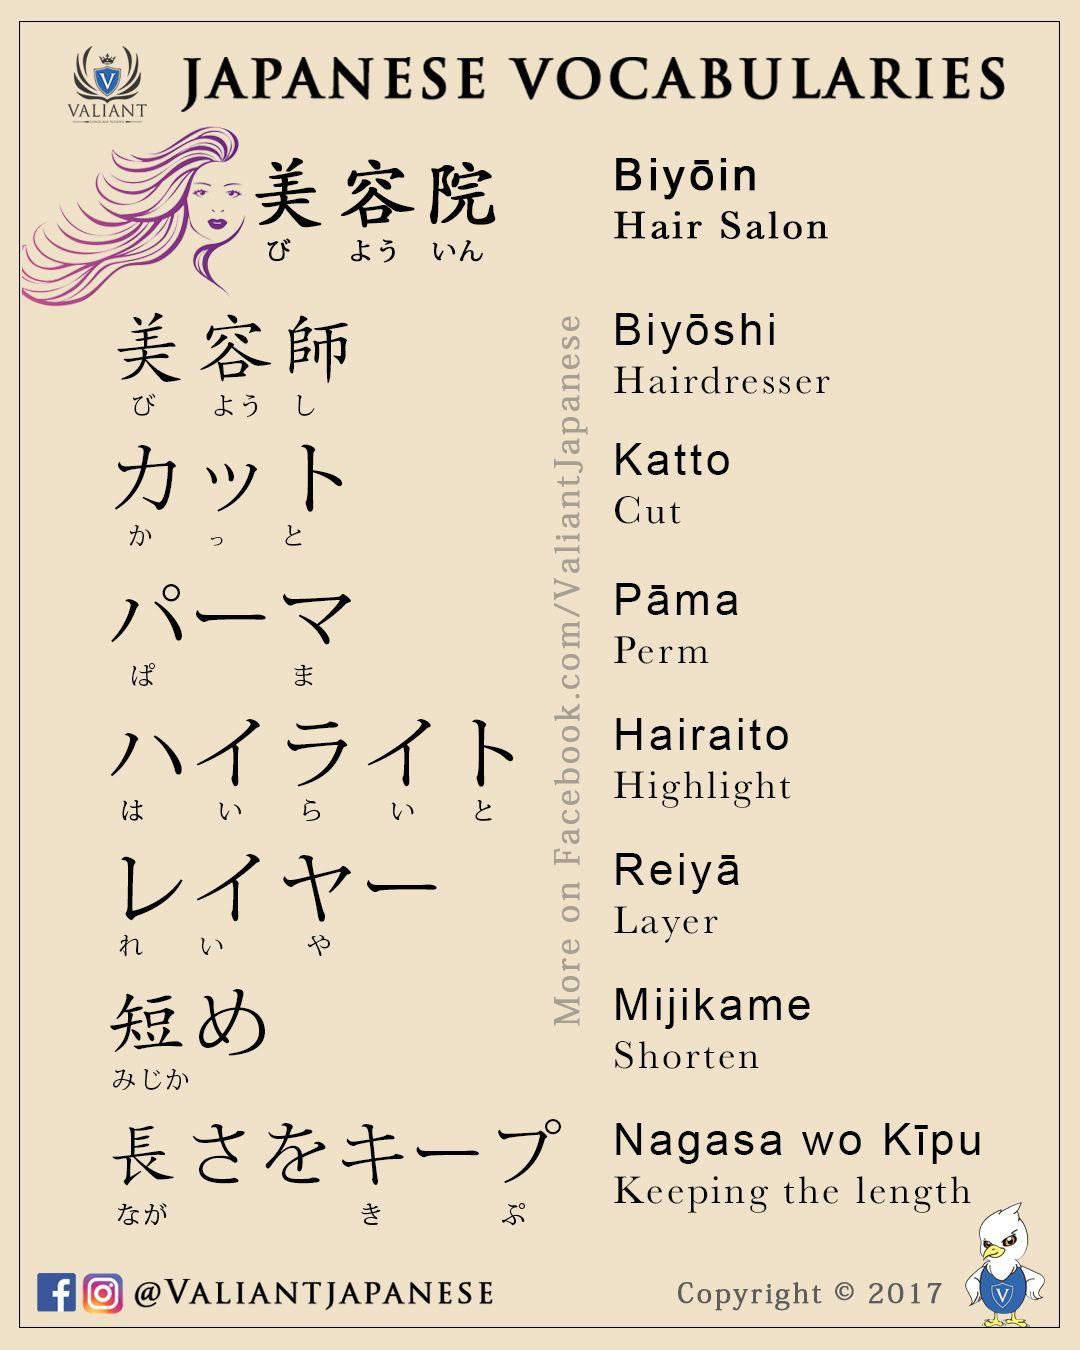 worksheet Japanese Culture Worksheets pin by anamika on konichiwa pinterest japanese language worksheets